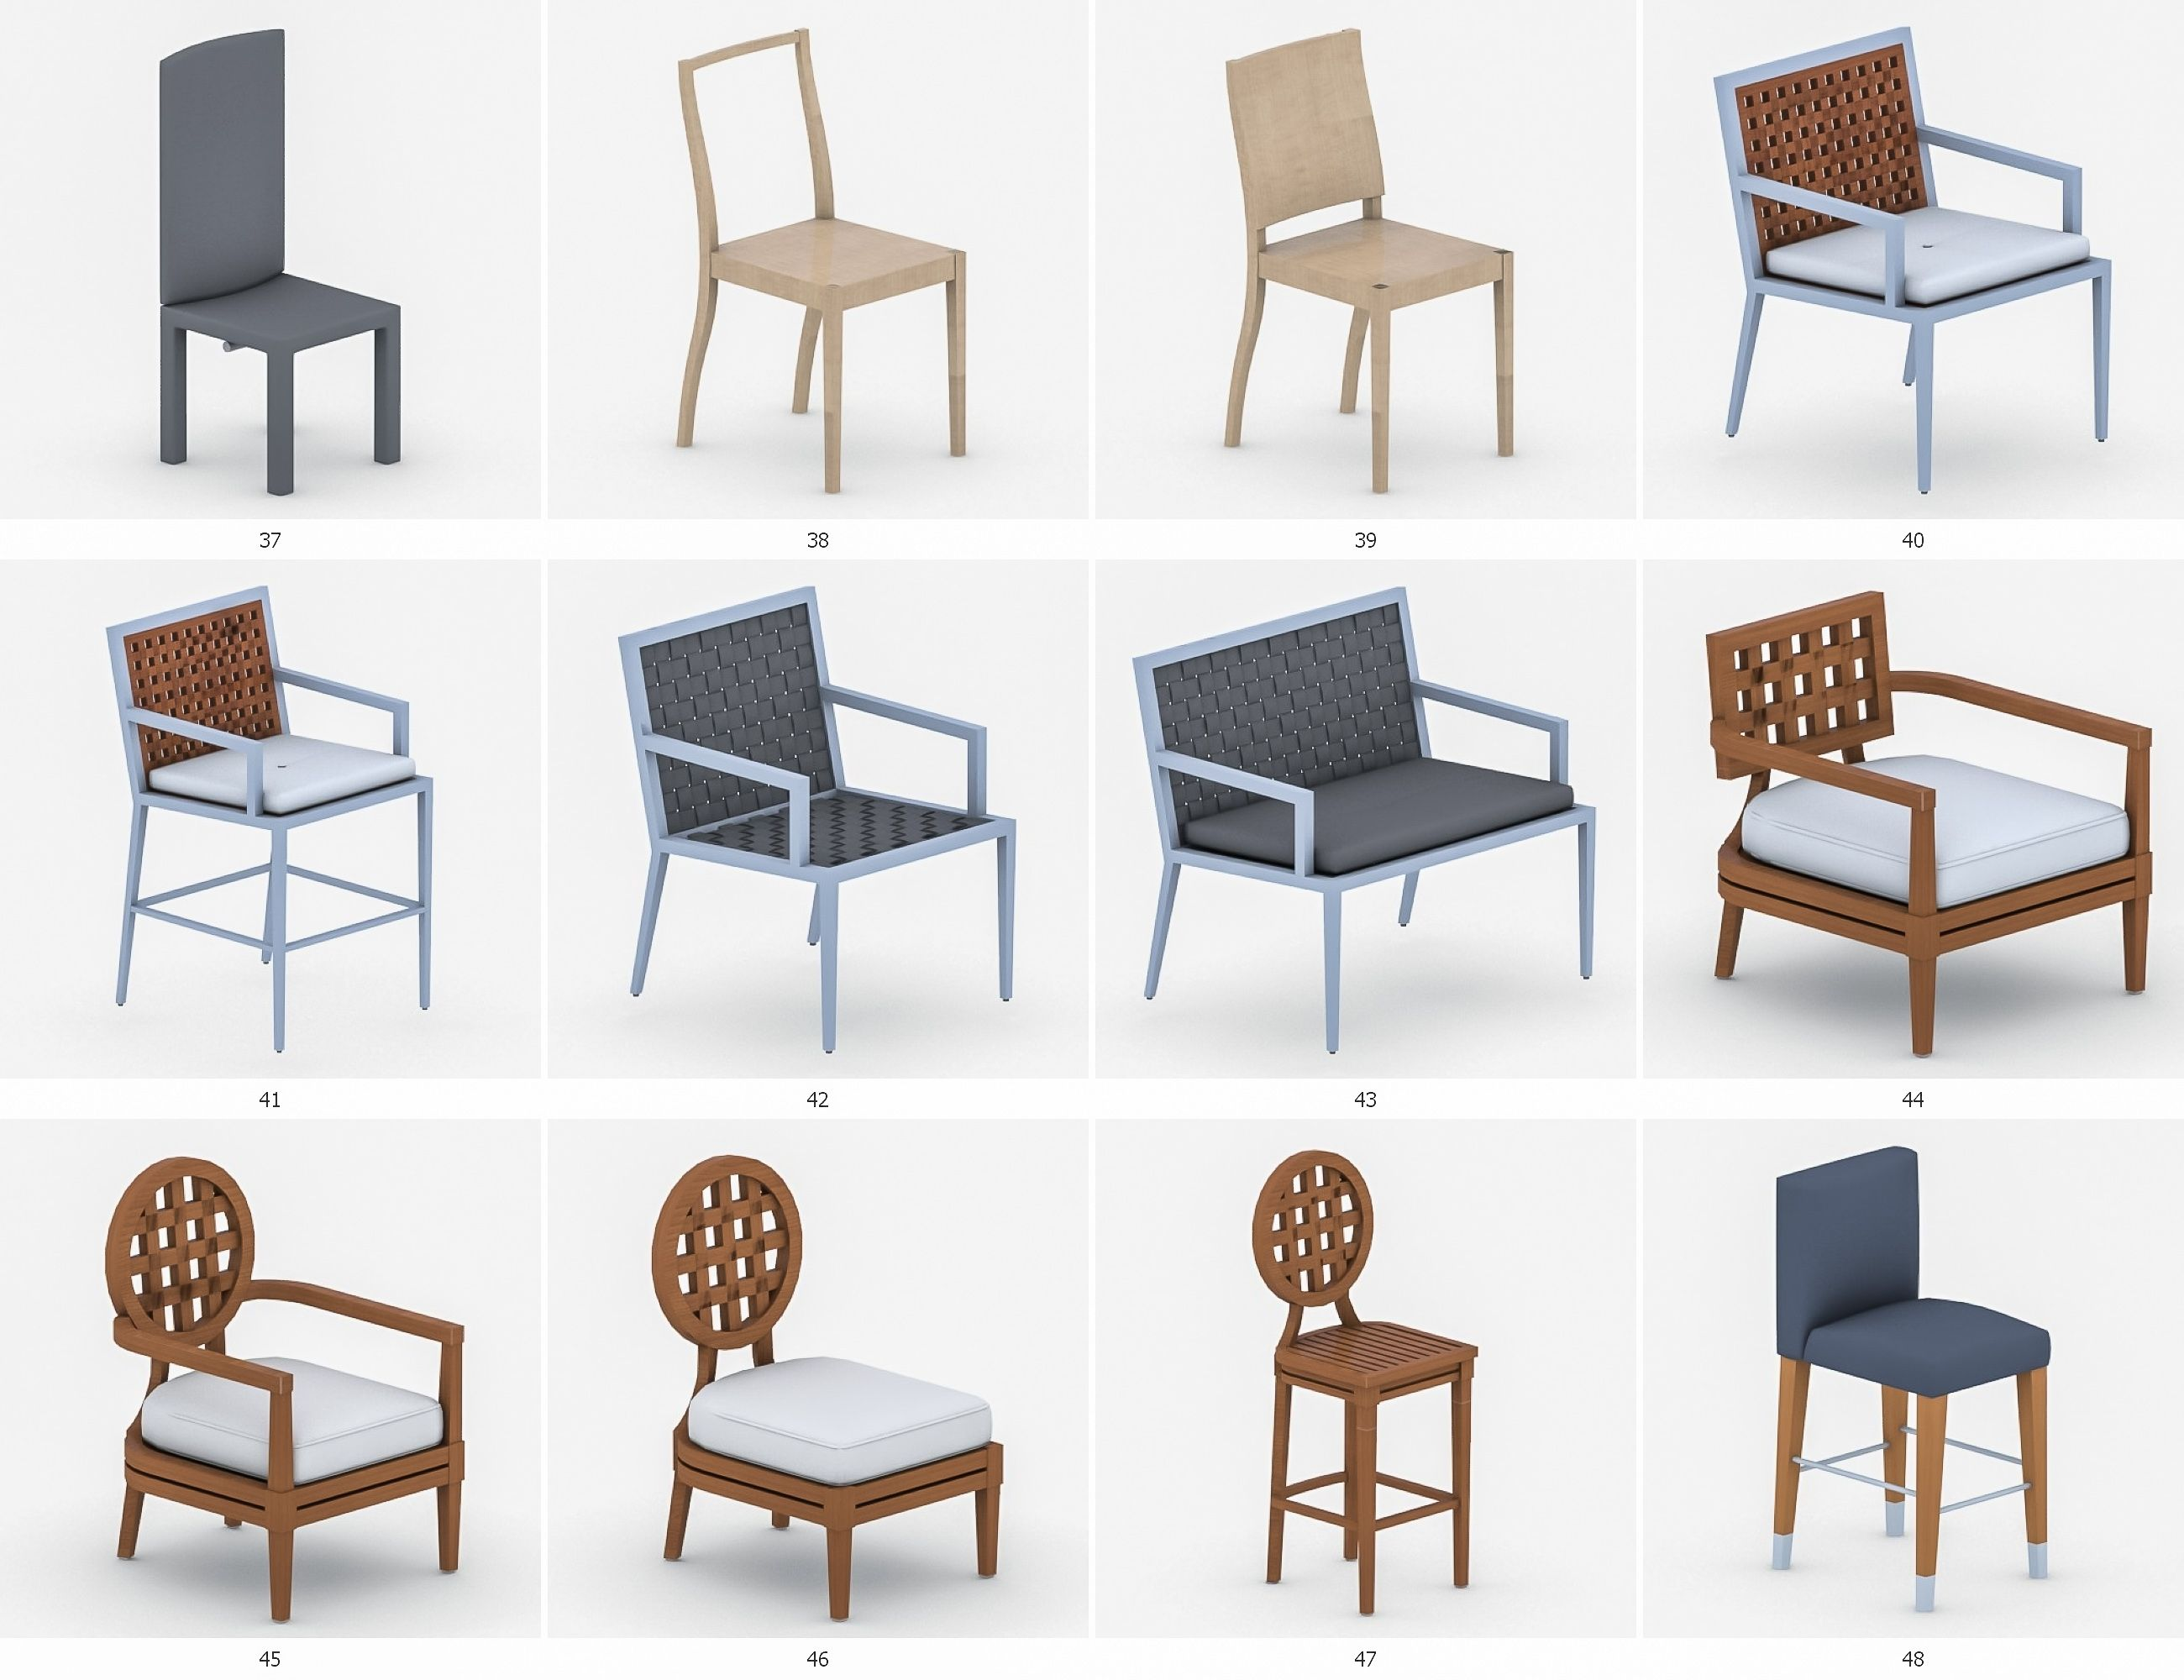 Chairs Collection Vol 3 Chairs, Collection, Vol Chair